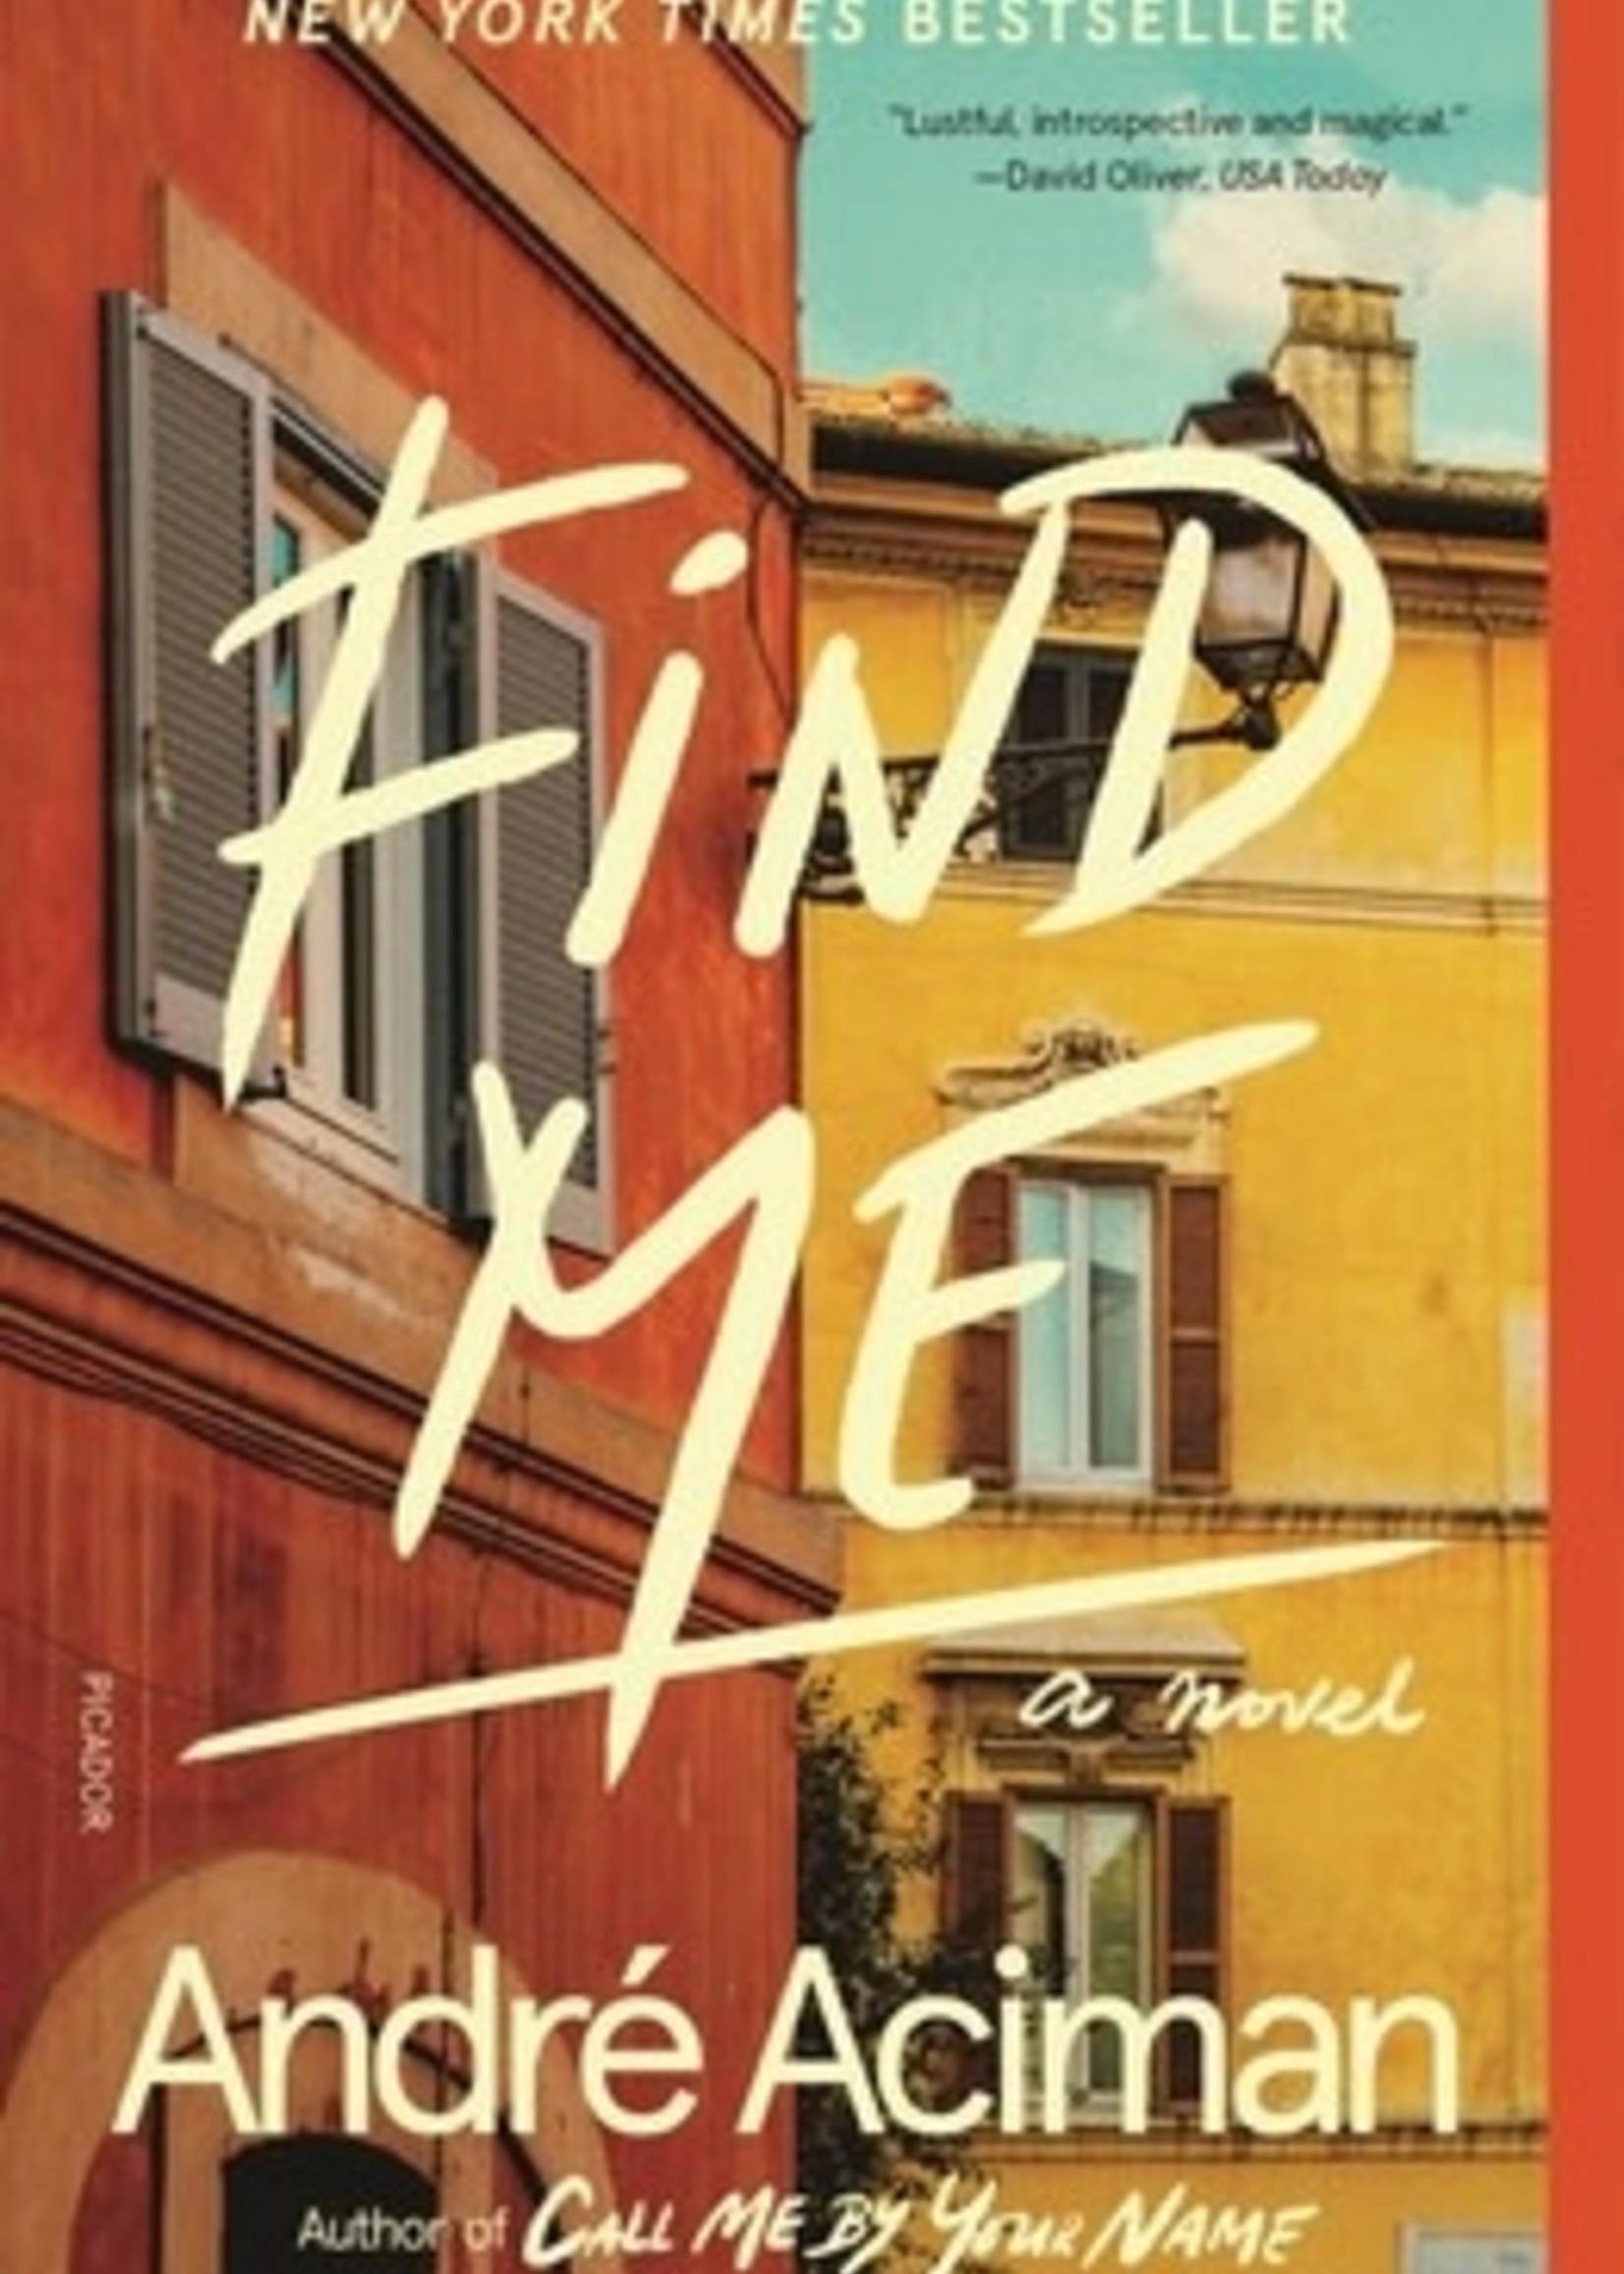 Find Me by André Aciman